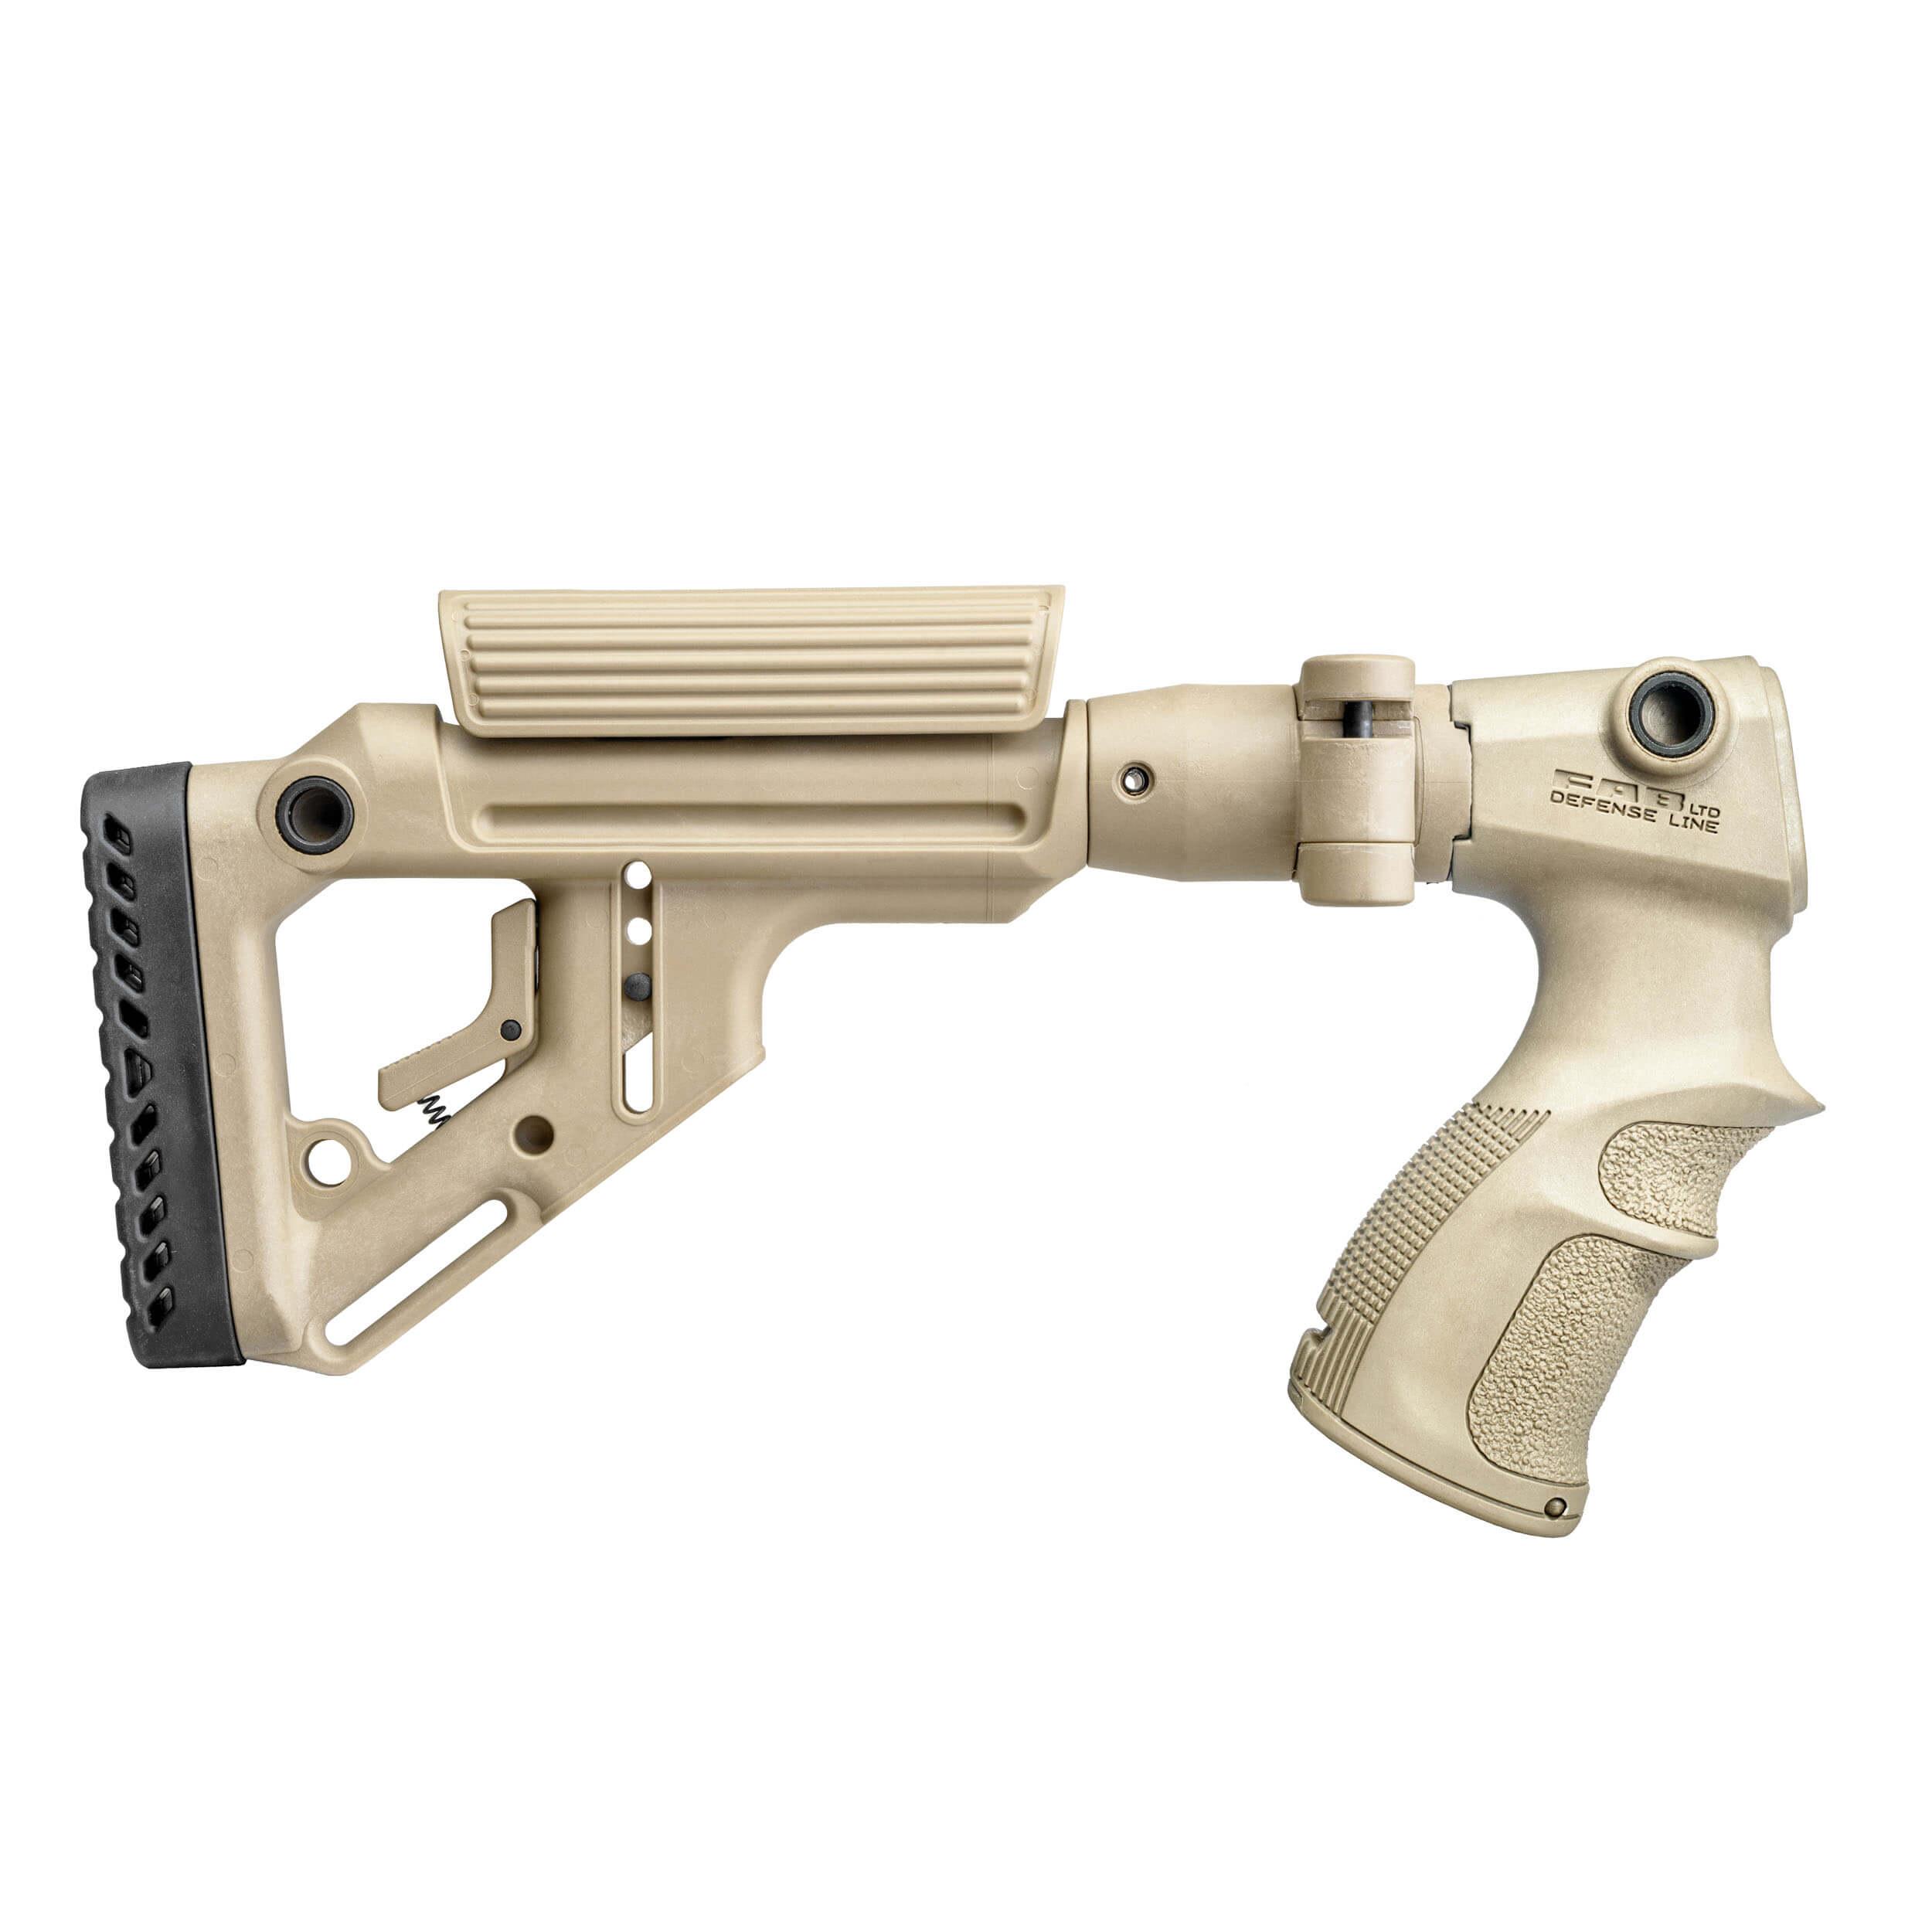 Remington 870 folding buttstock / cheek rest